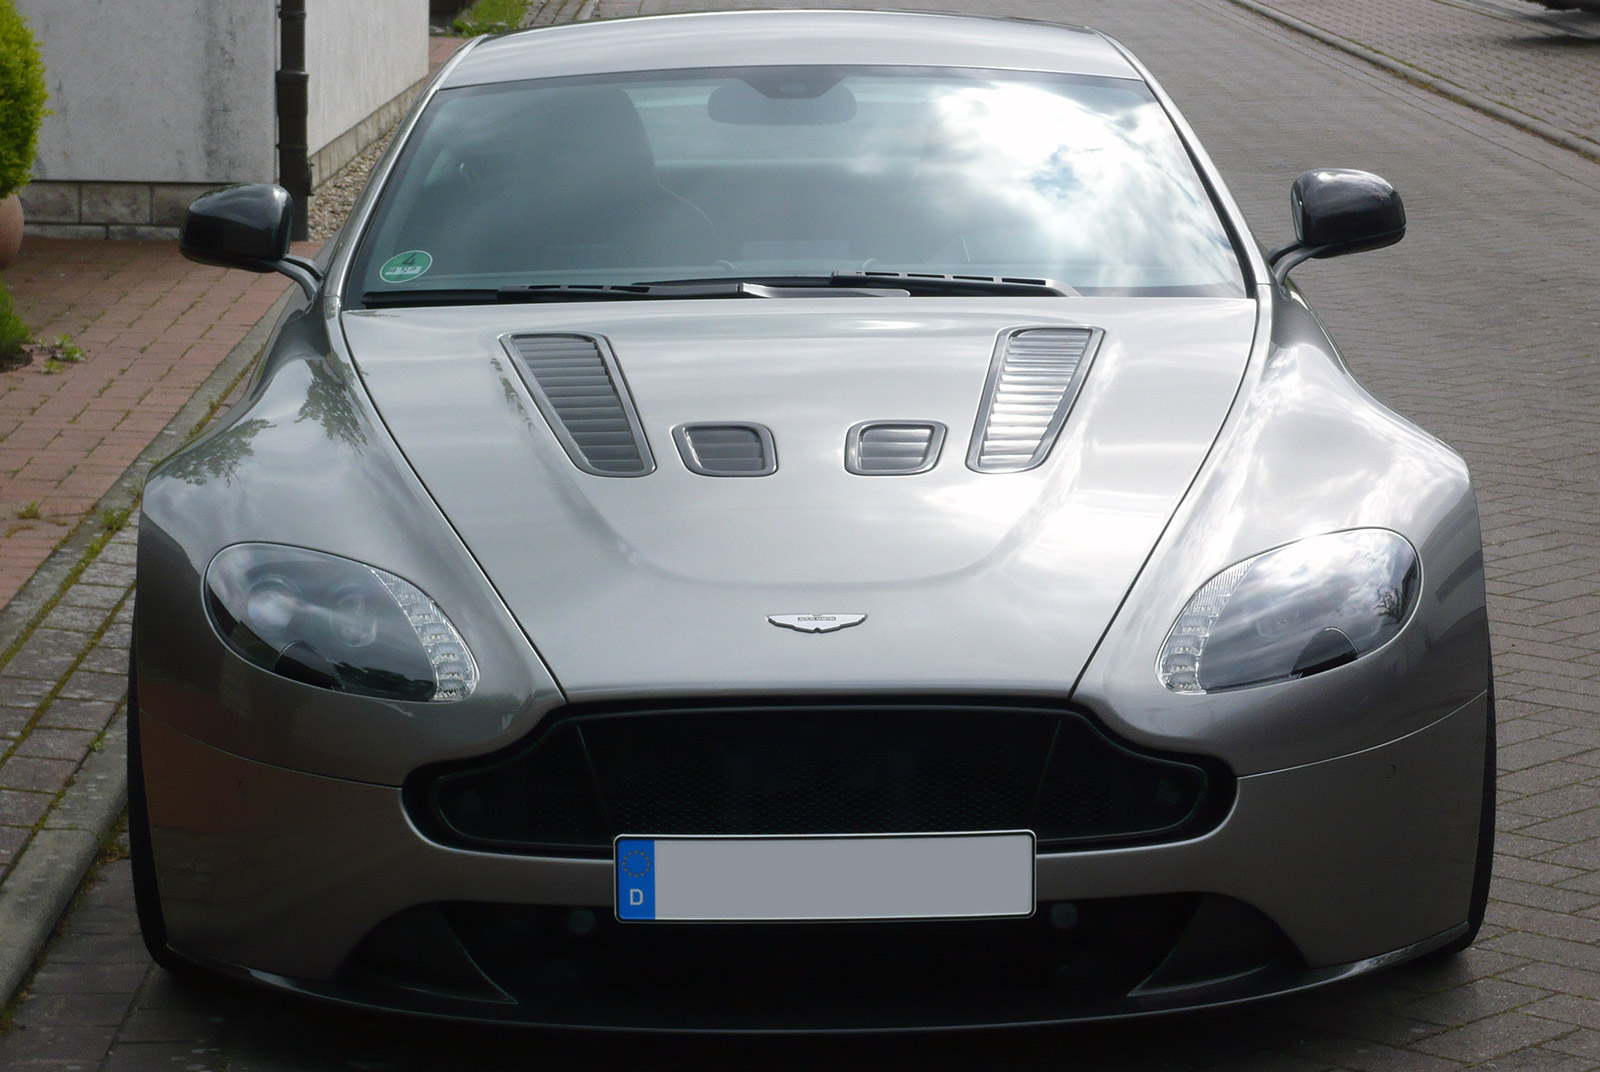 AM-2995-Aston-Martin_V12-Vantage-S_Grau_Schwarz_03